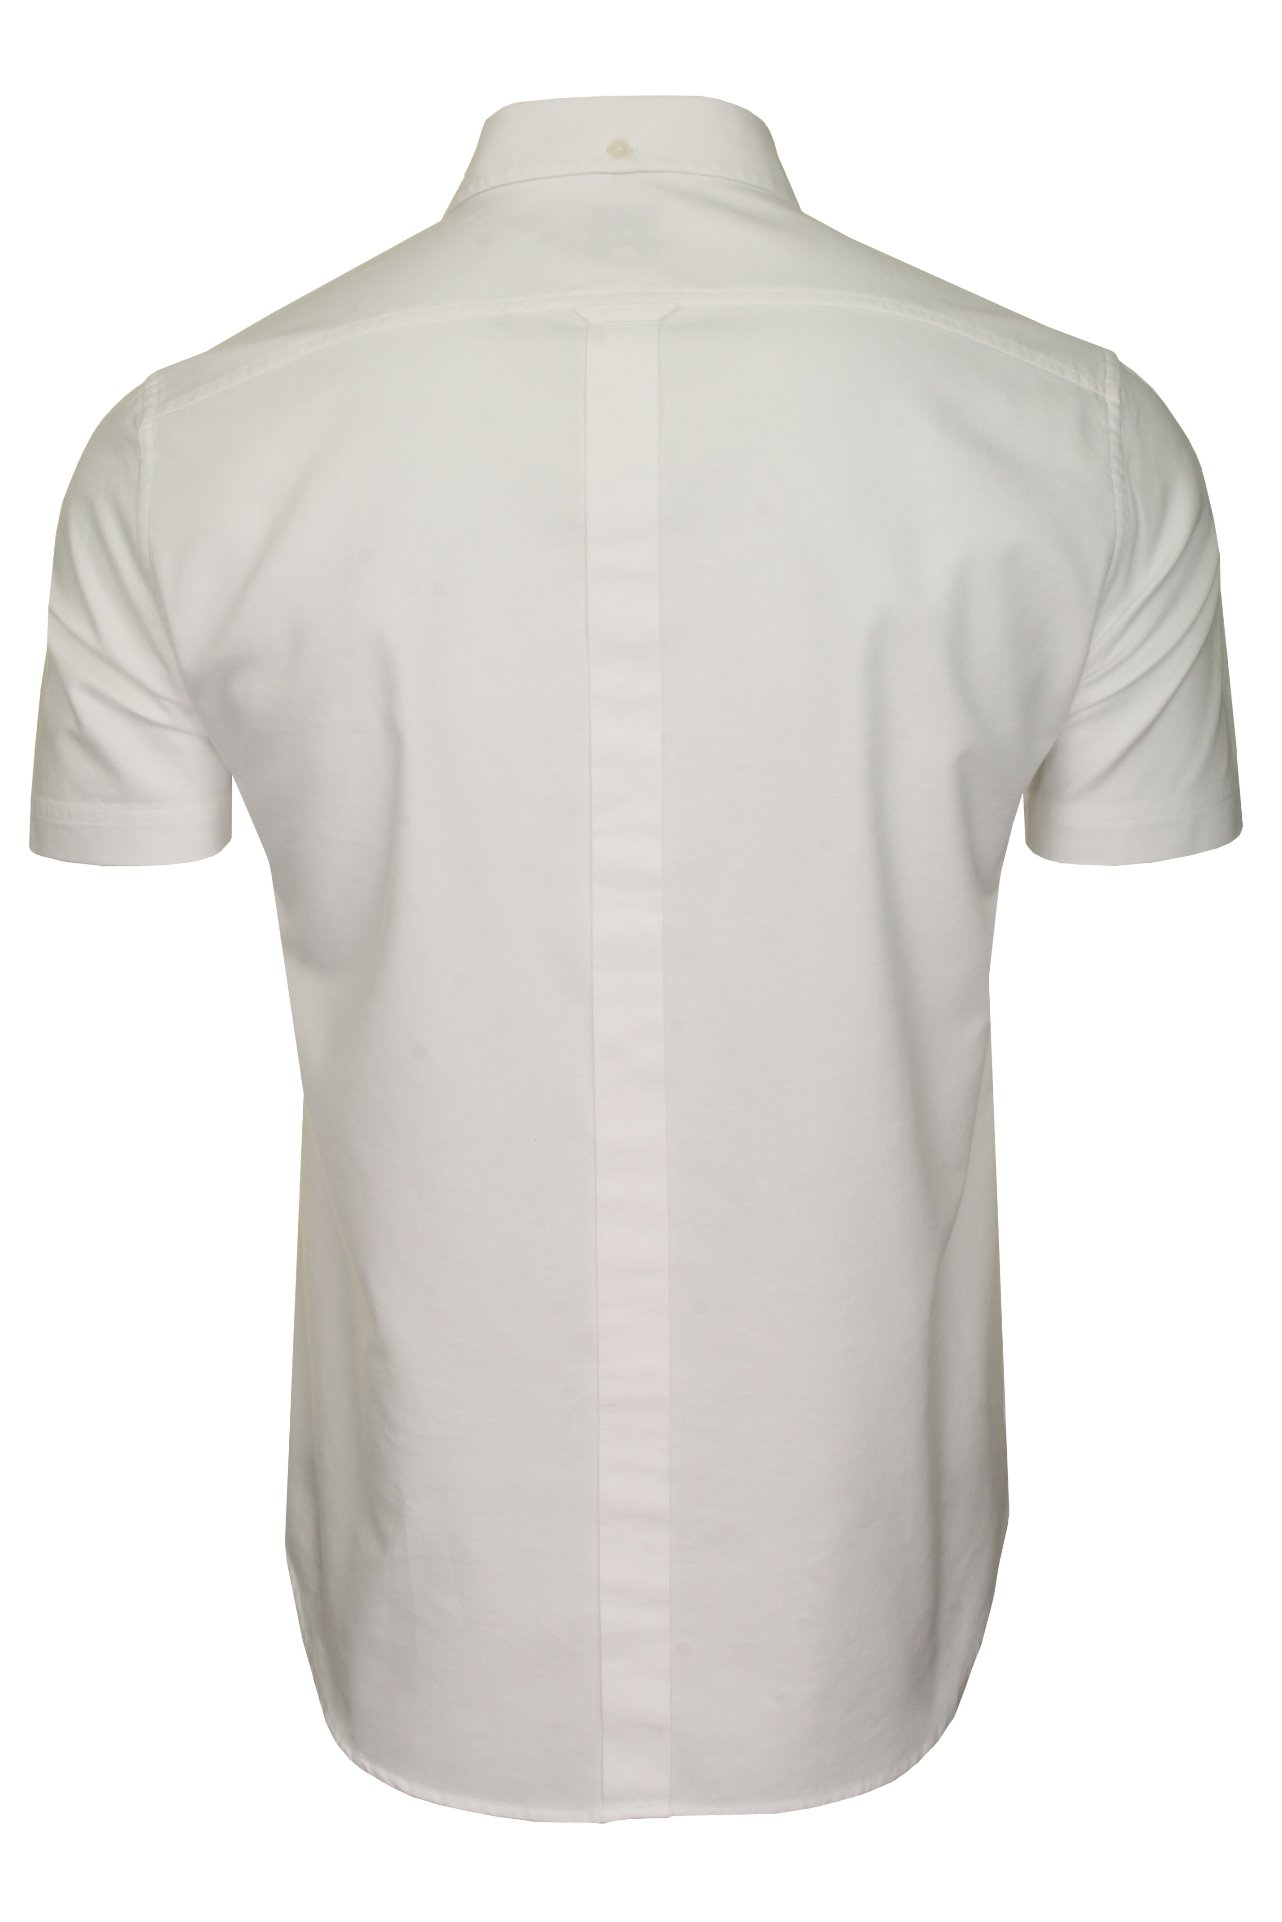 Ben-Sherman-Mens-Oxford-Shirt-Short-Sleeve thumbnail 46